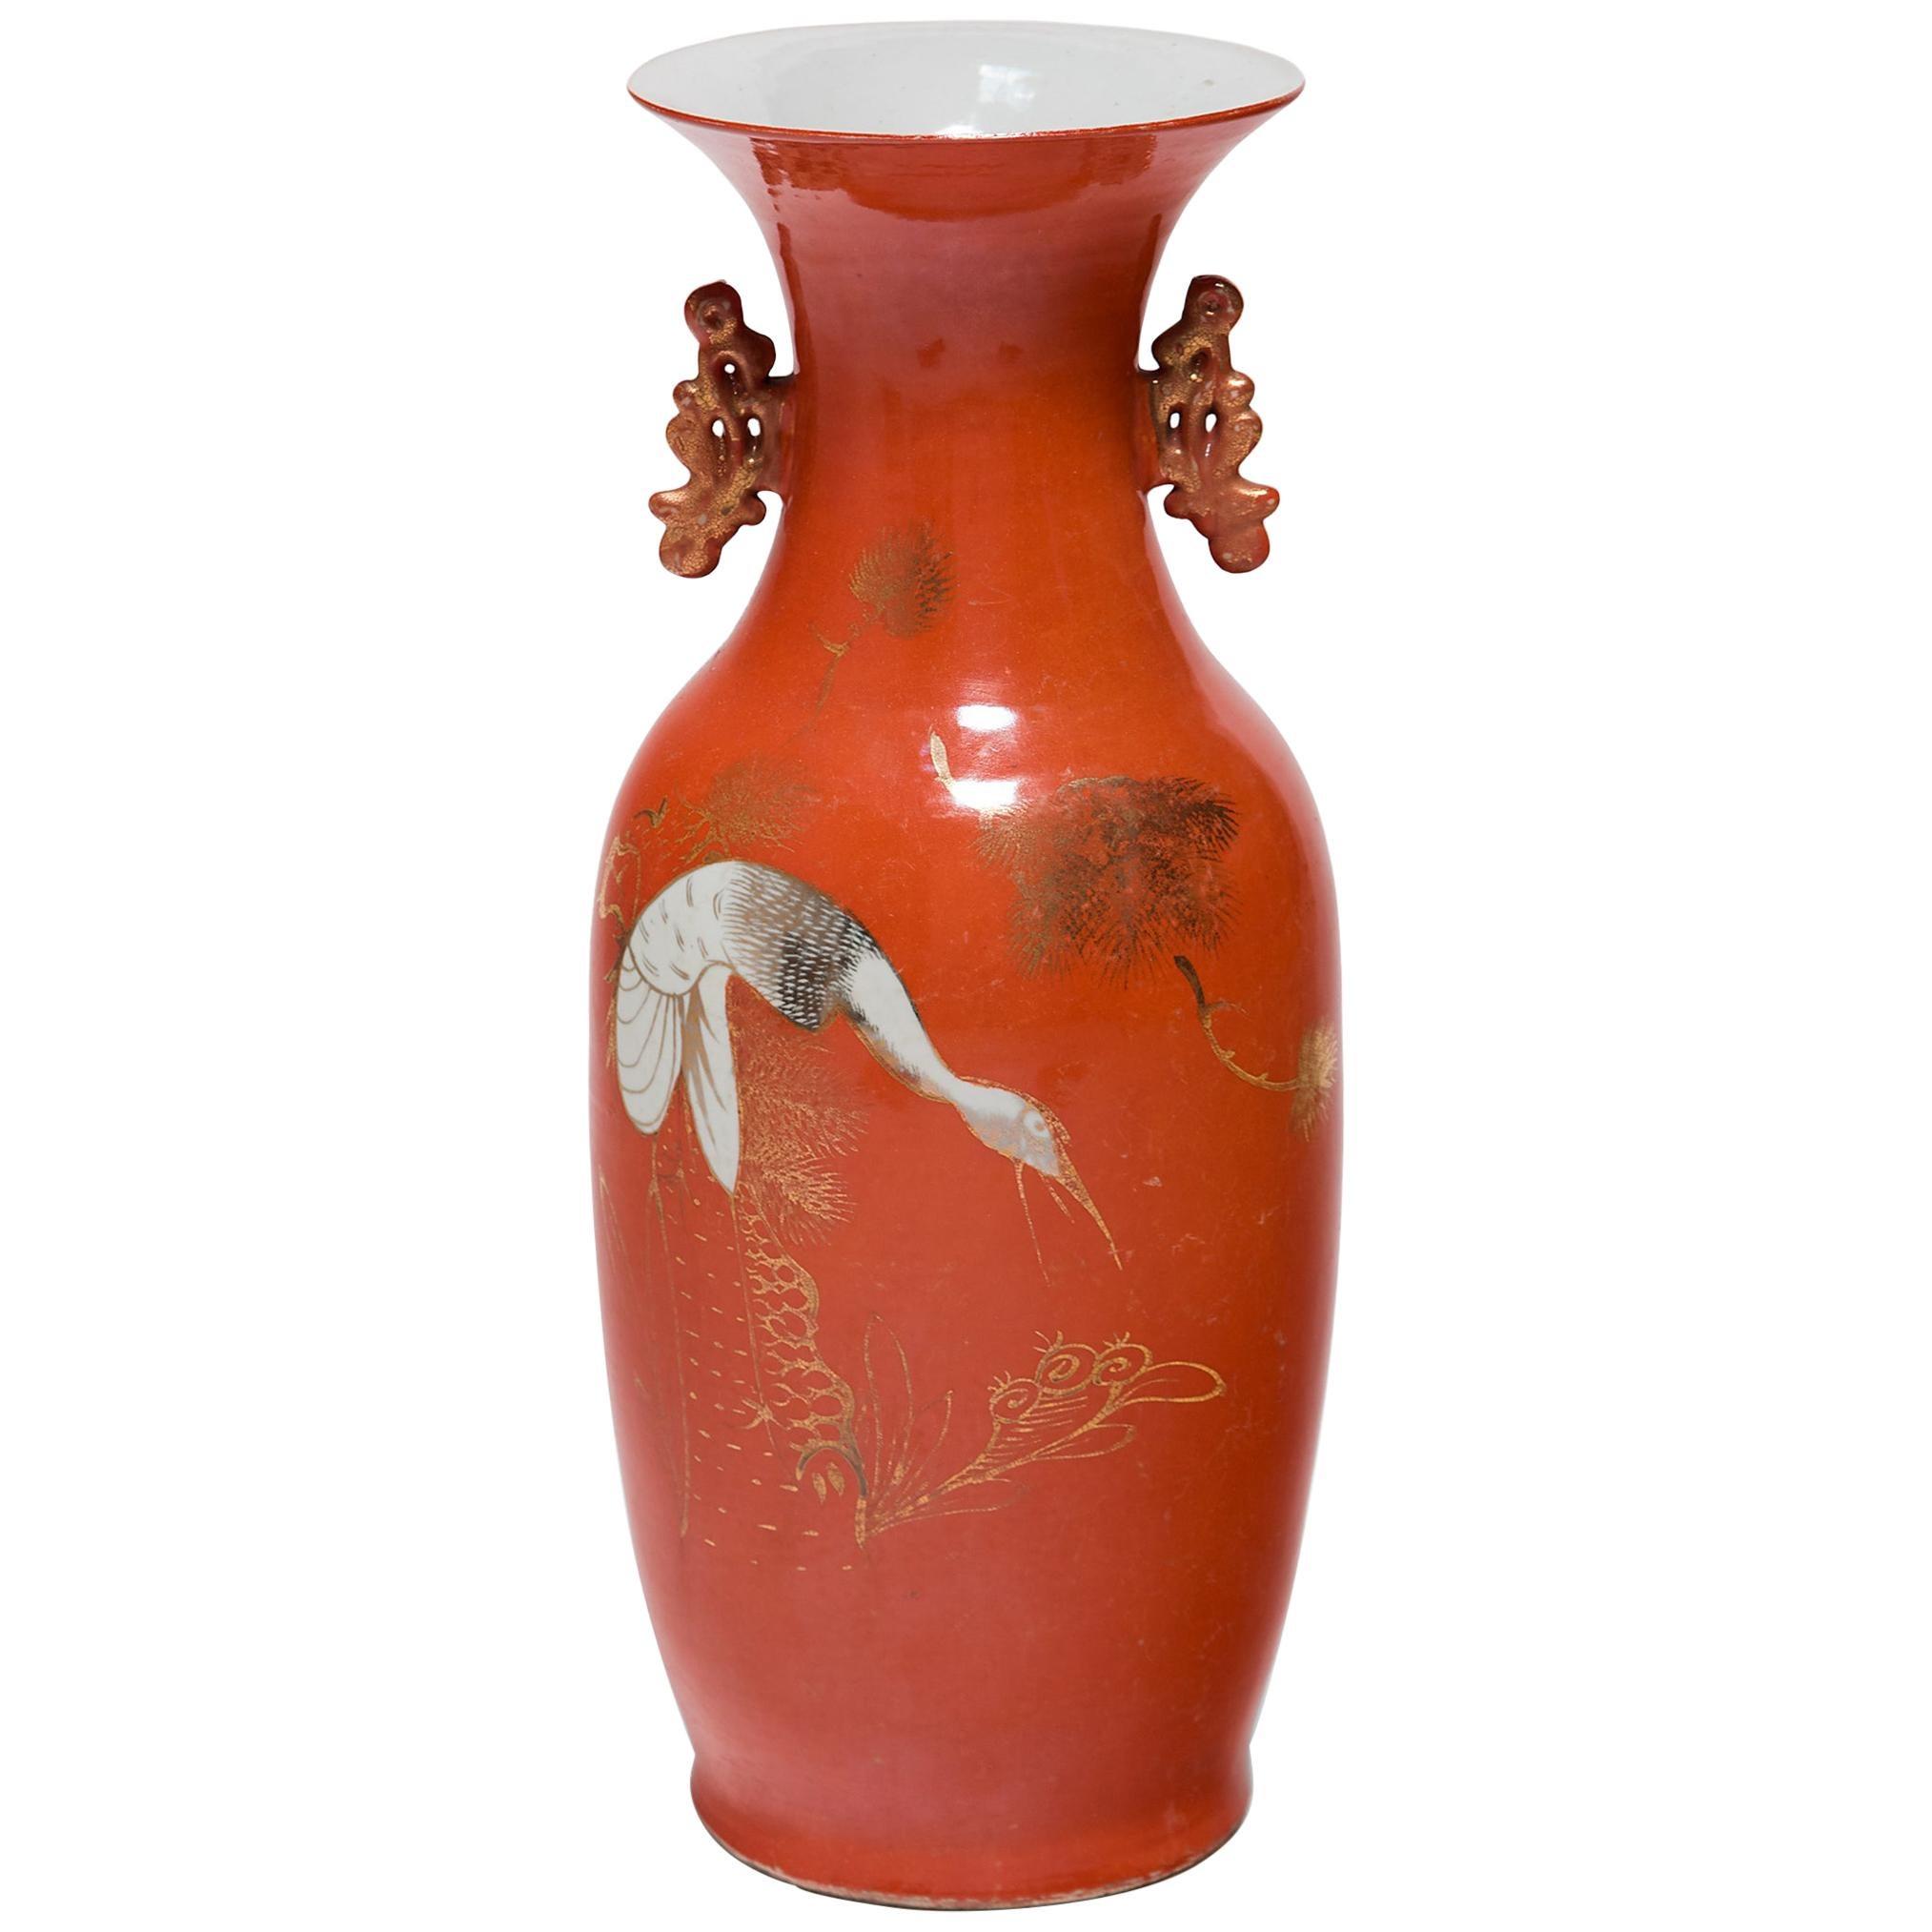 Chinese Art Deco Persimmon Vase with White Cranes, circa 1920s